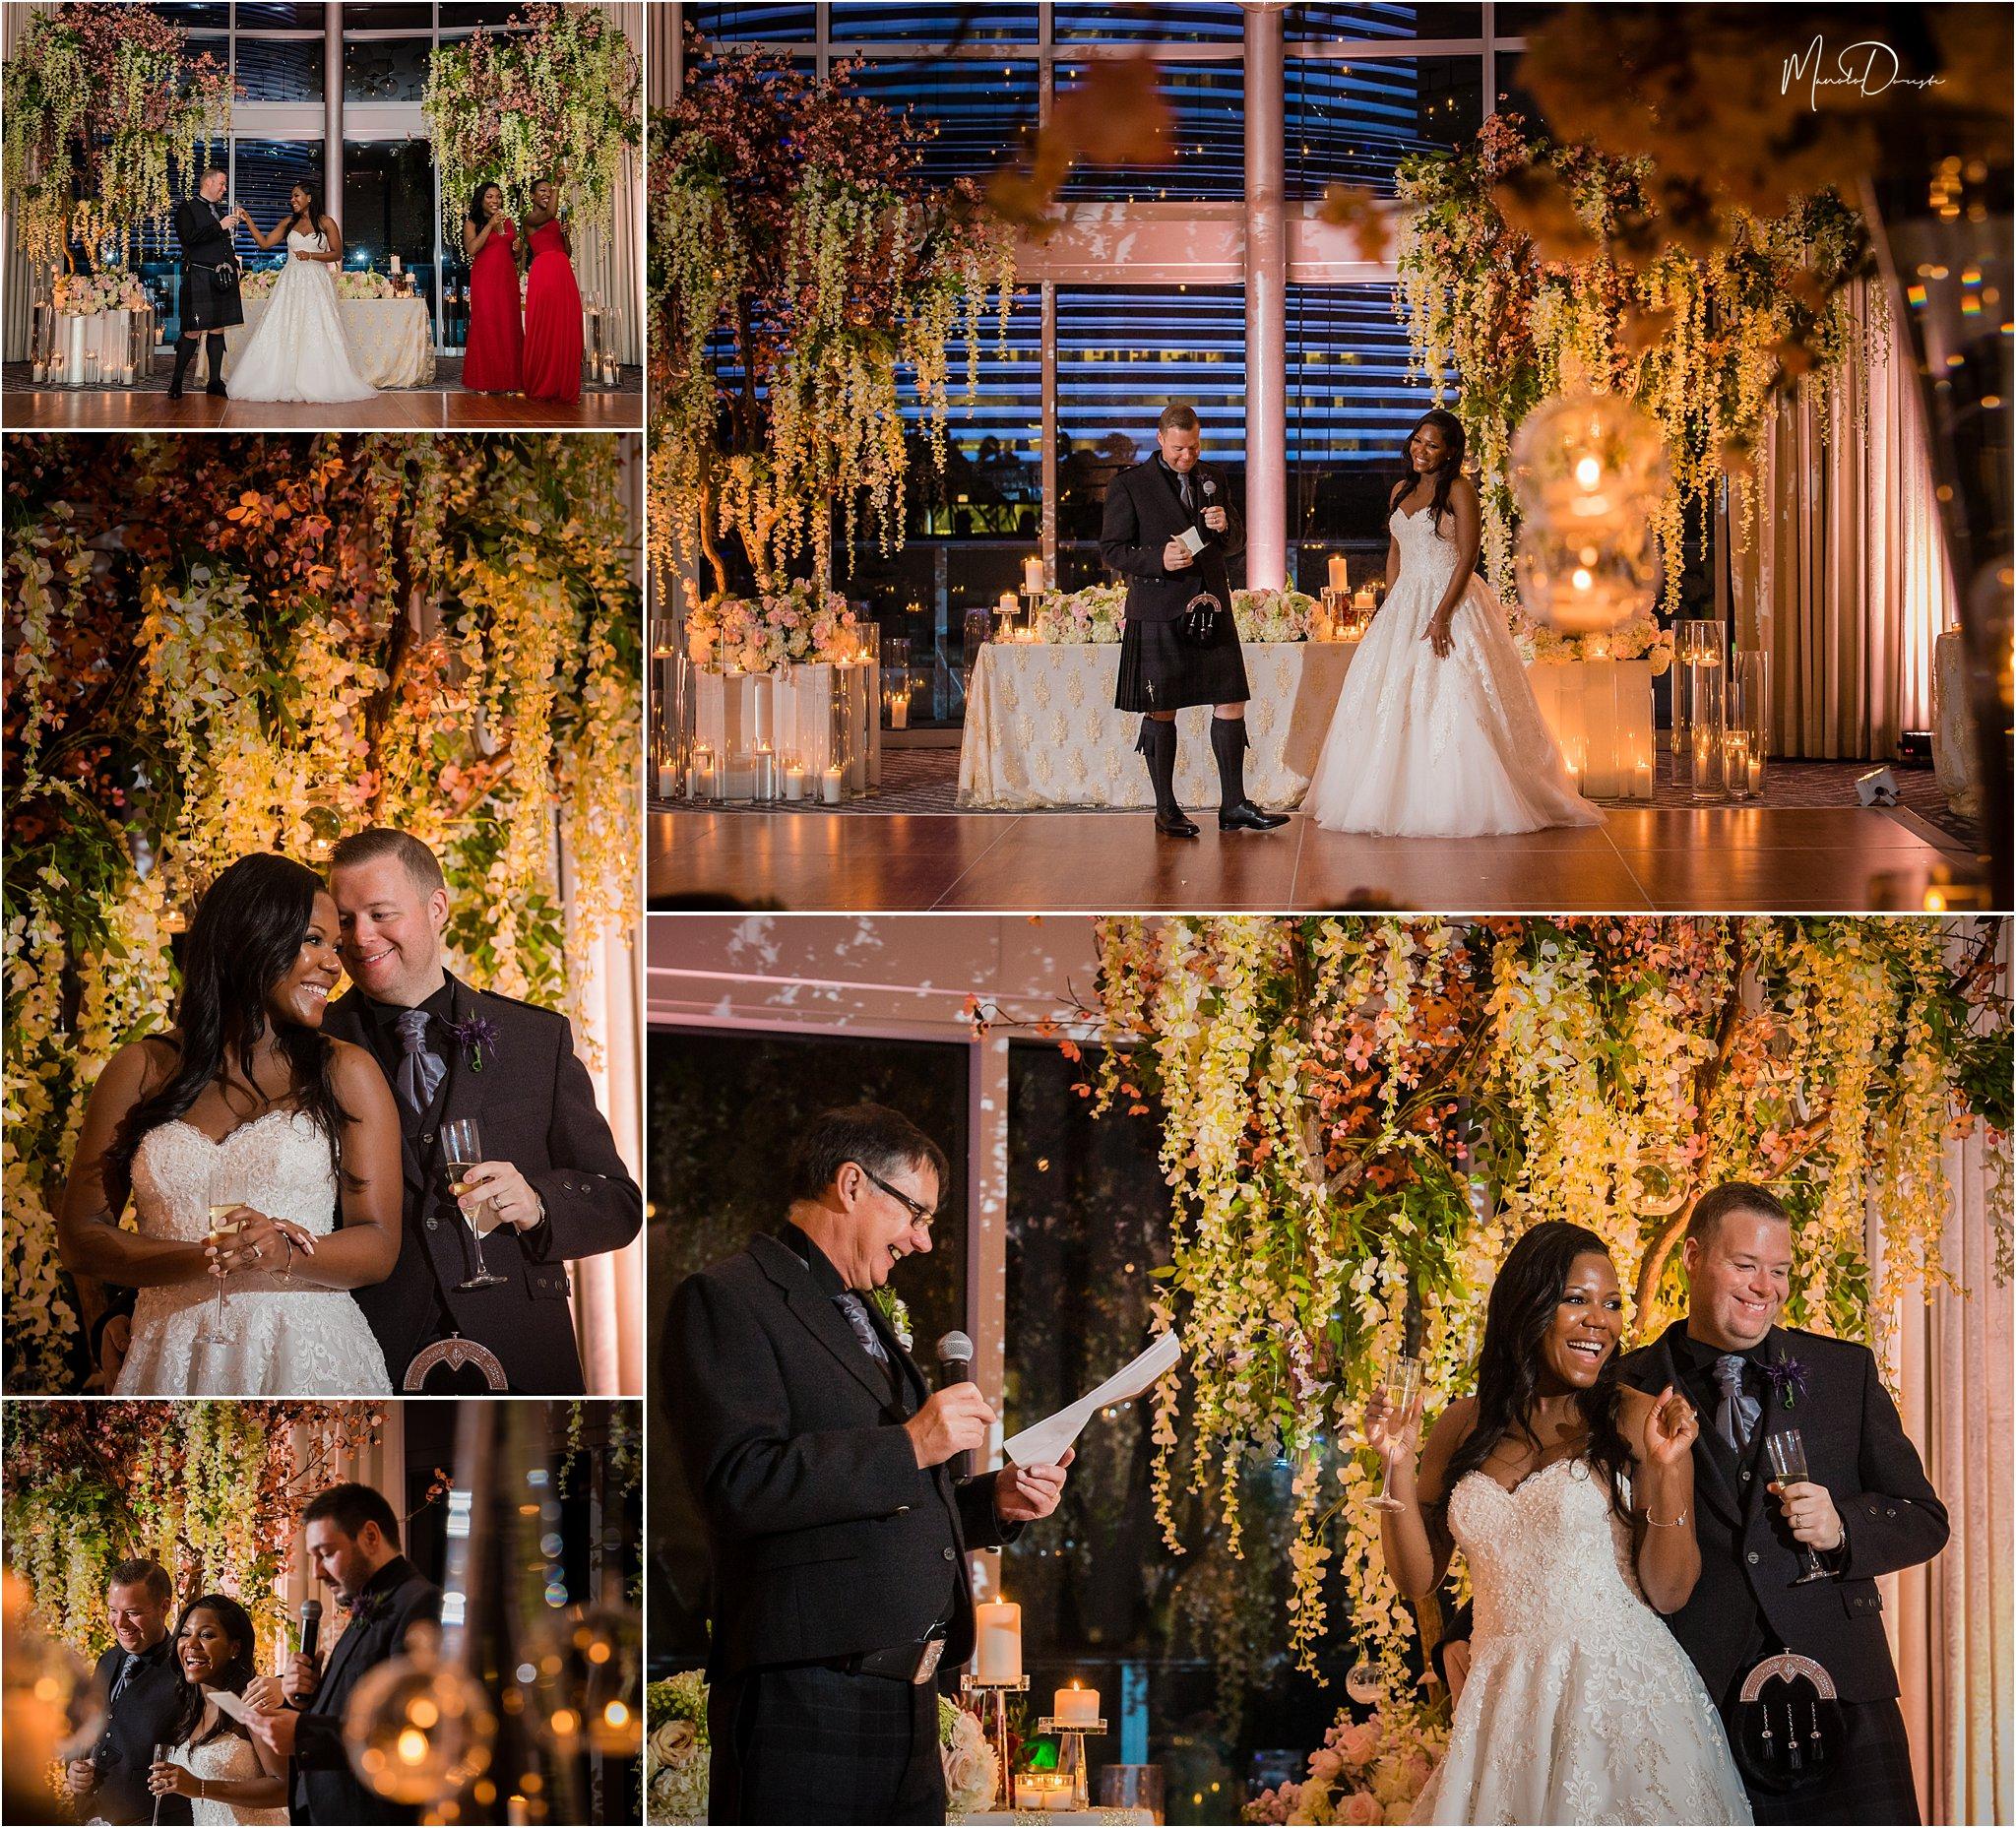 0130_ManoloDoreste_InFocusStudios_Wedding_Family_Photography_Miami_MiamiPhotographer.jpg